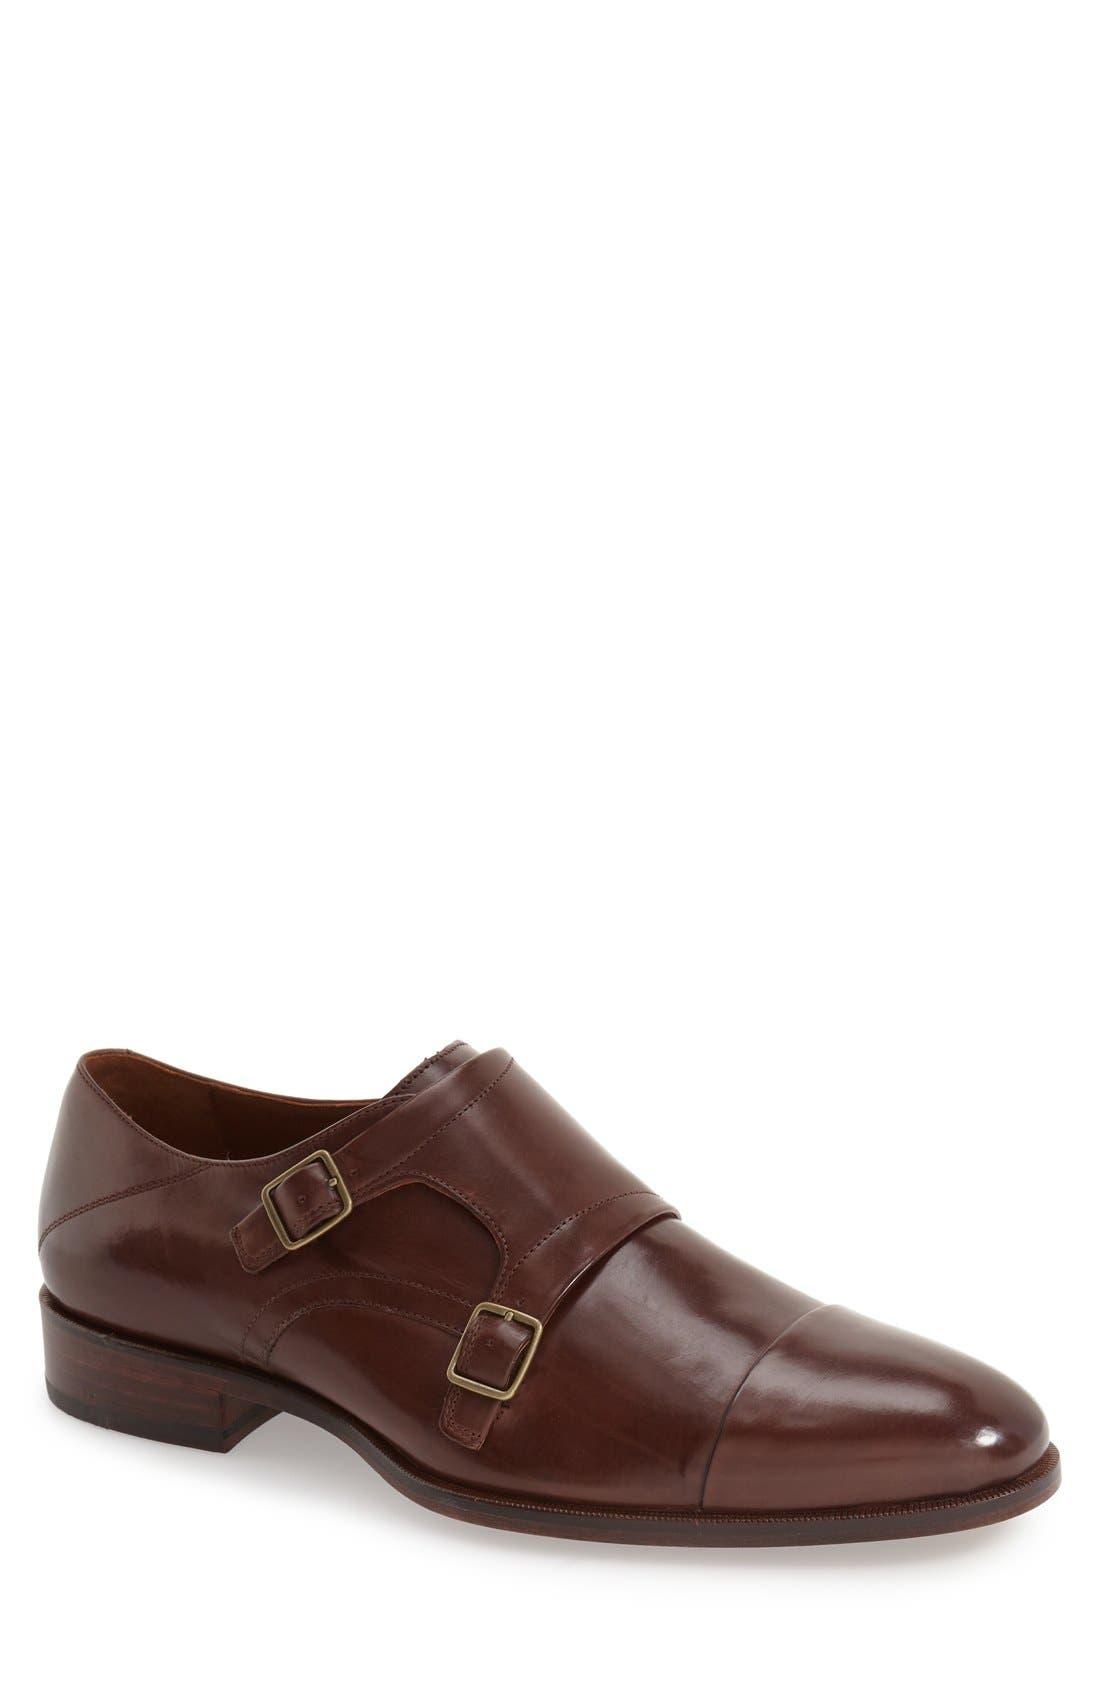 Alternate Image 1 Selected - Johnston & Murphy 'Nolen' Double Monk Strap Shoe (Men)